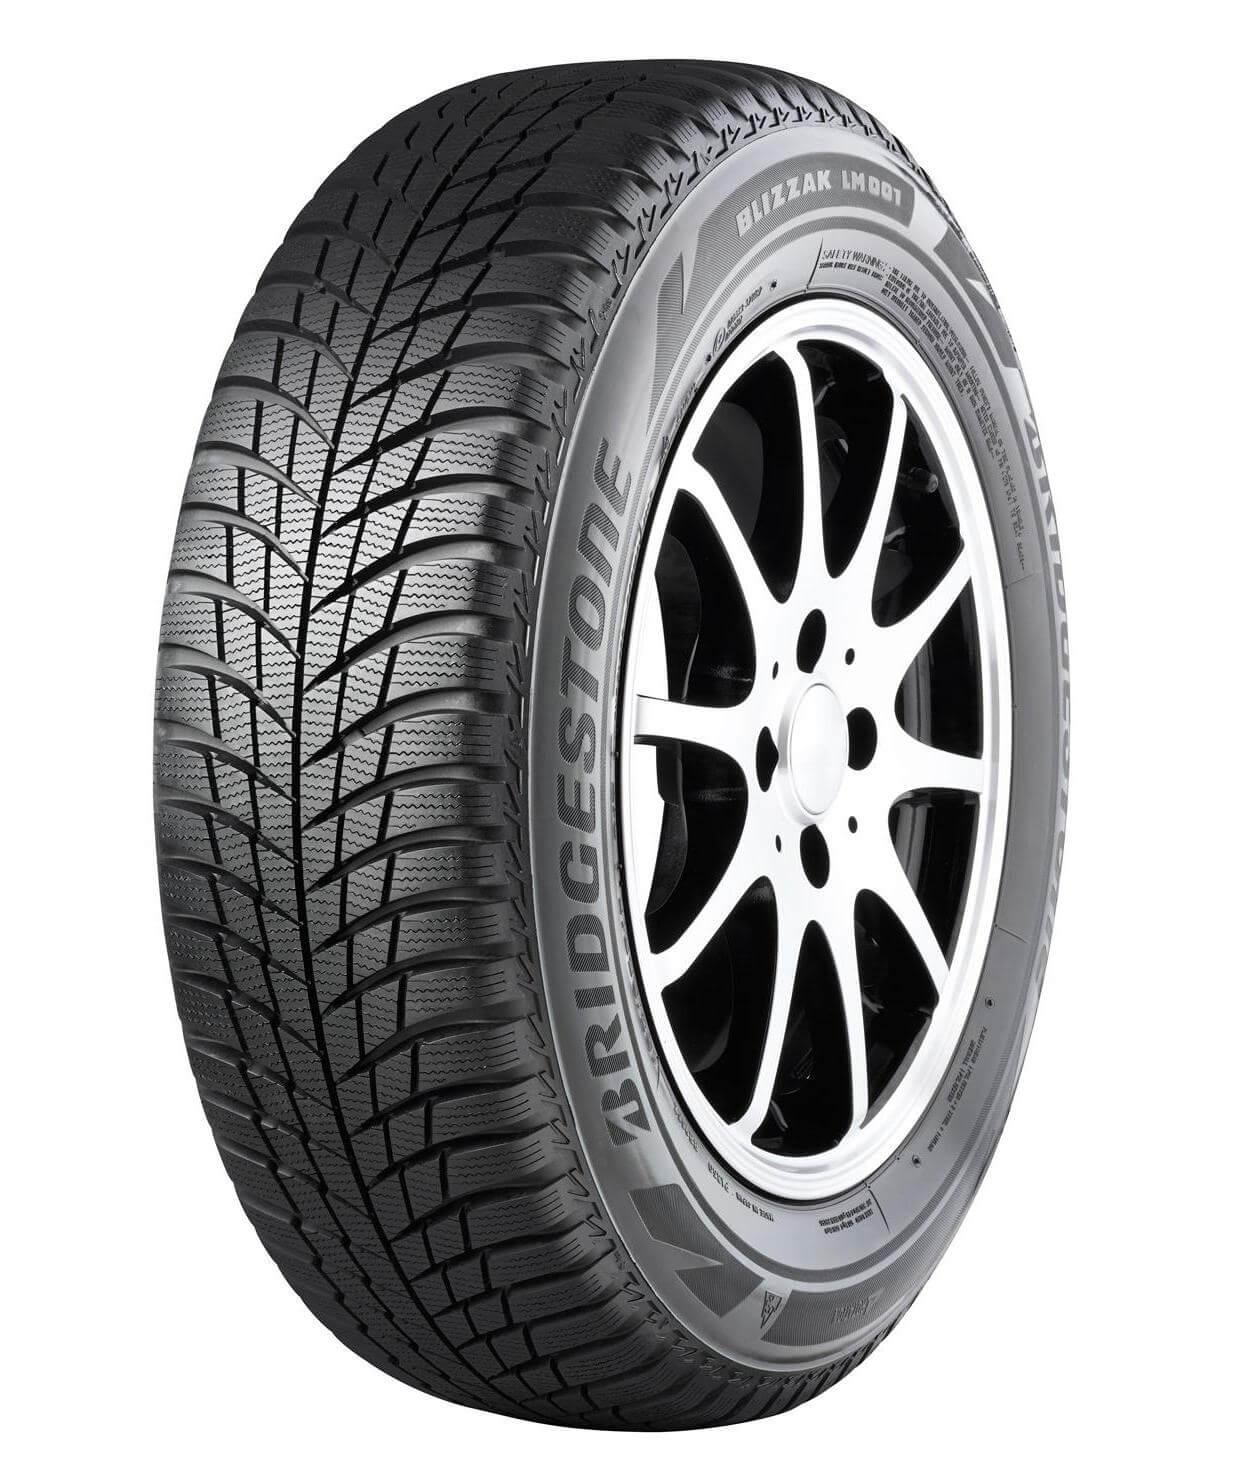 Bridgestone Blizzak LM 001 185/65 R15